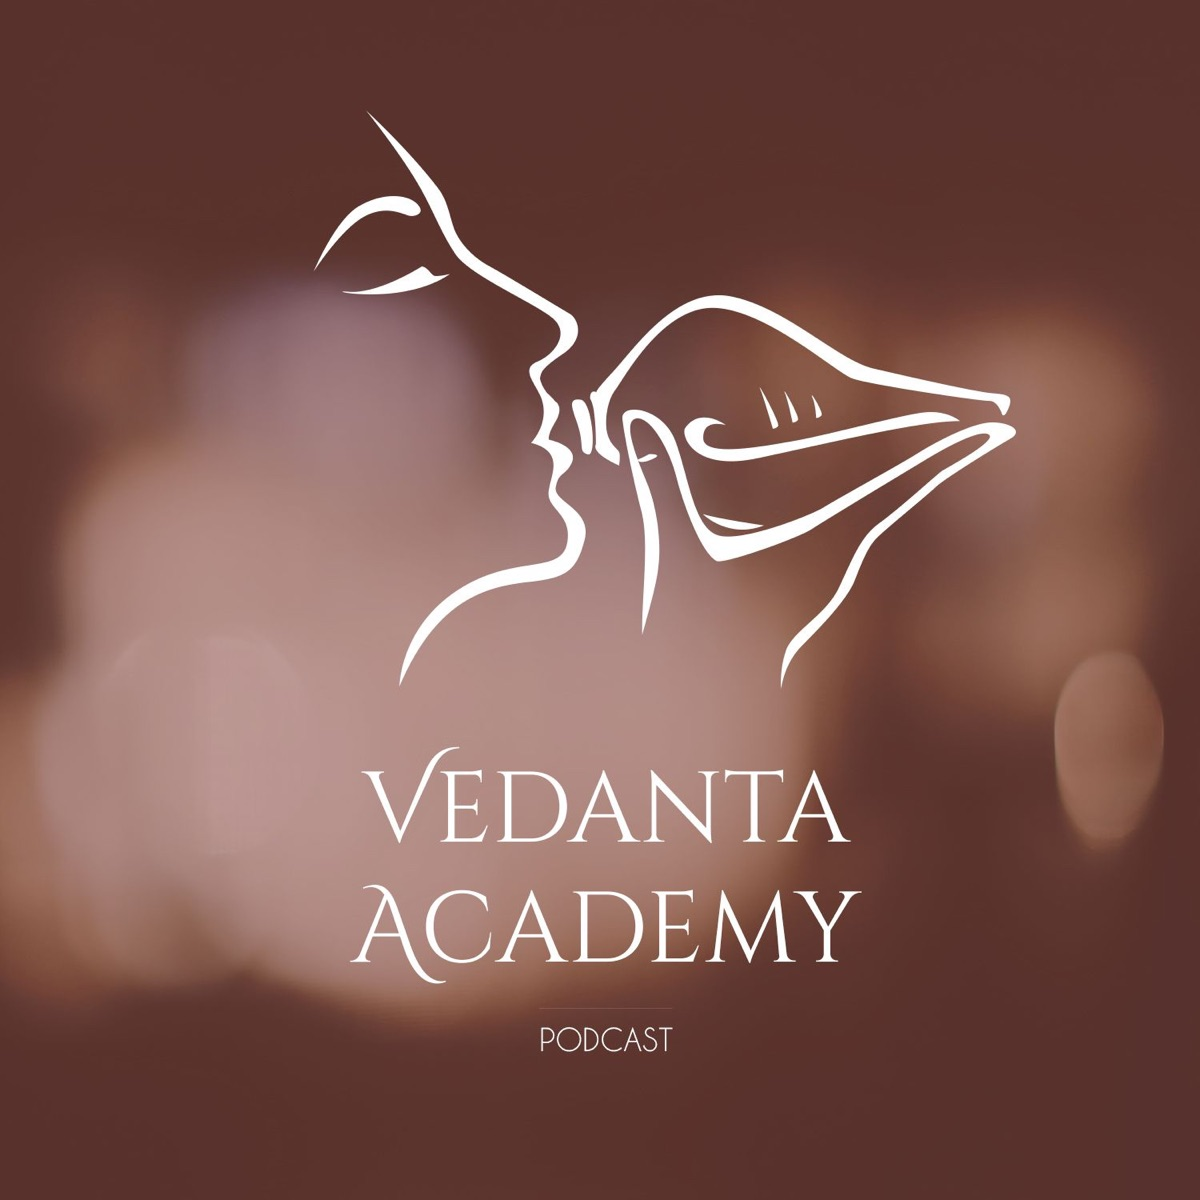 Vedanta Academy - Podcast